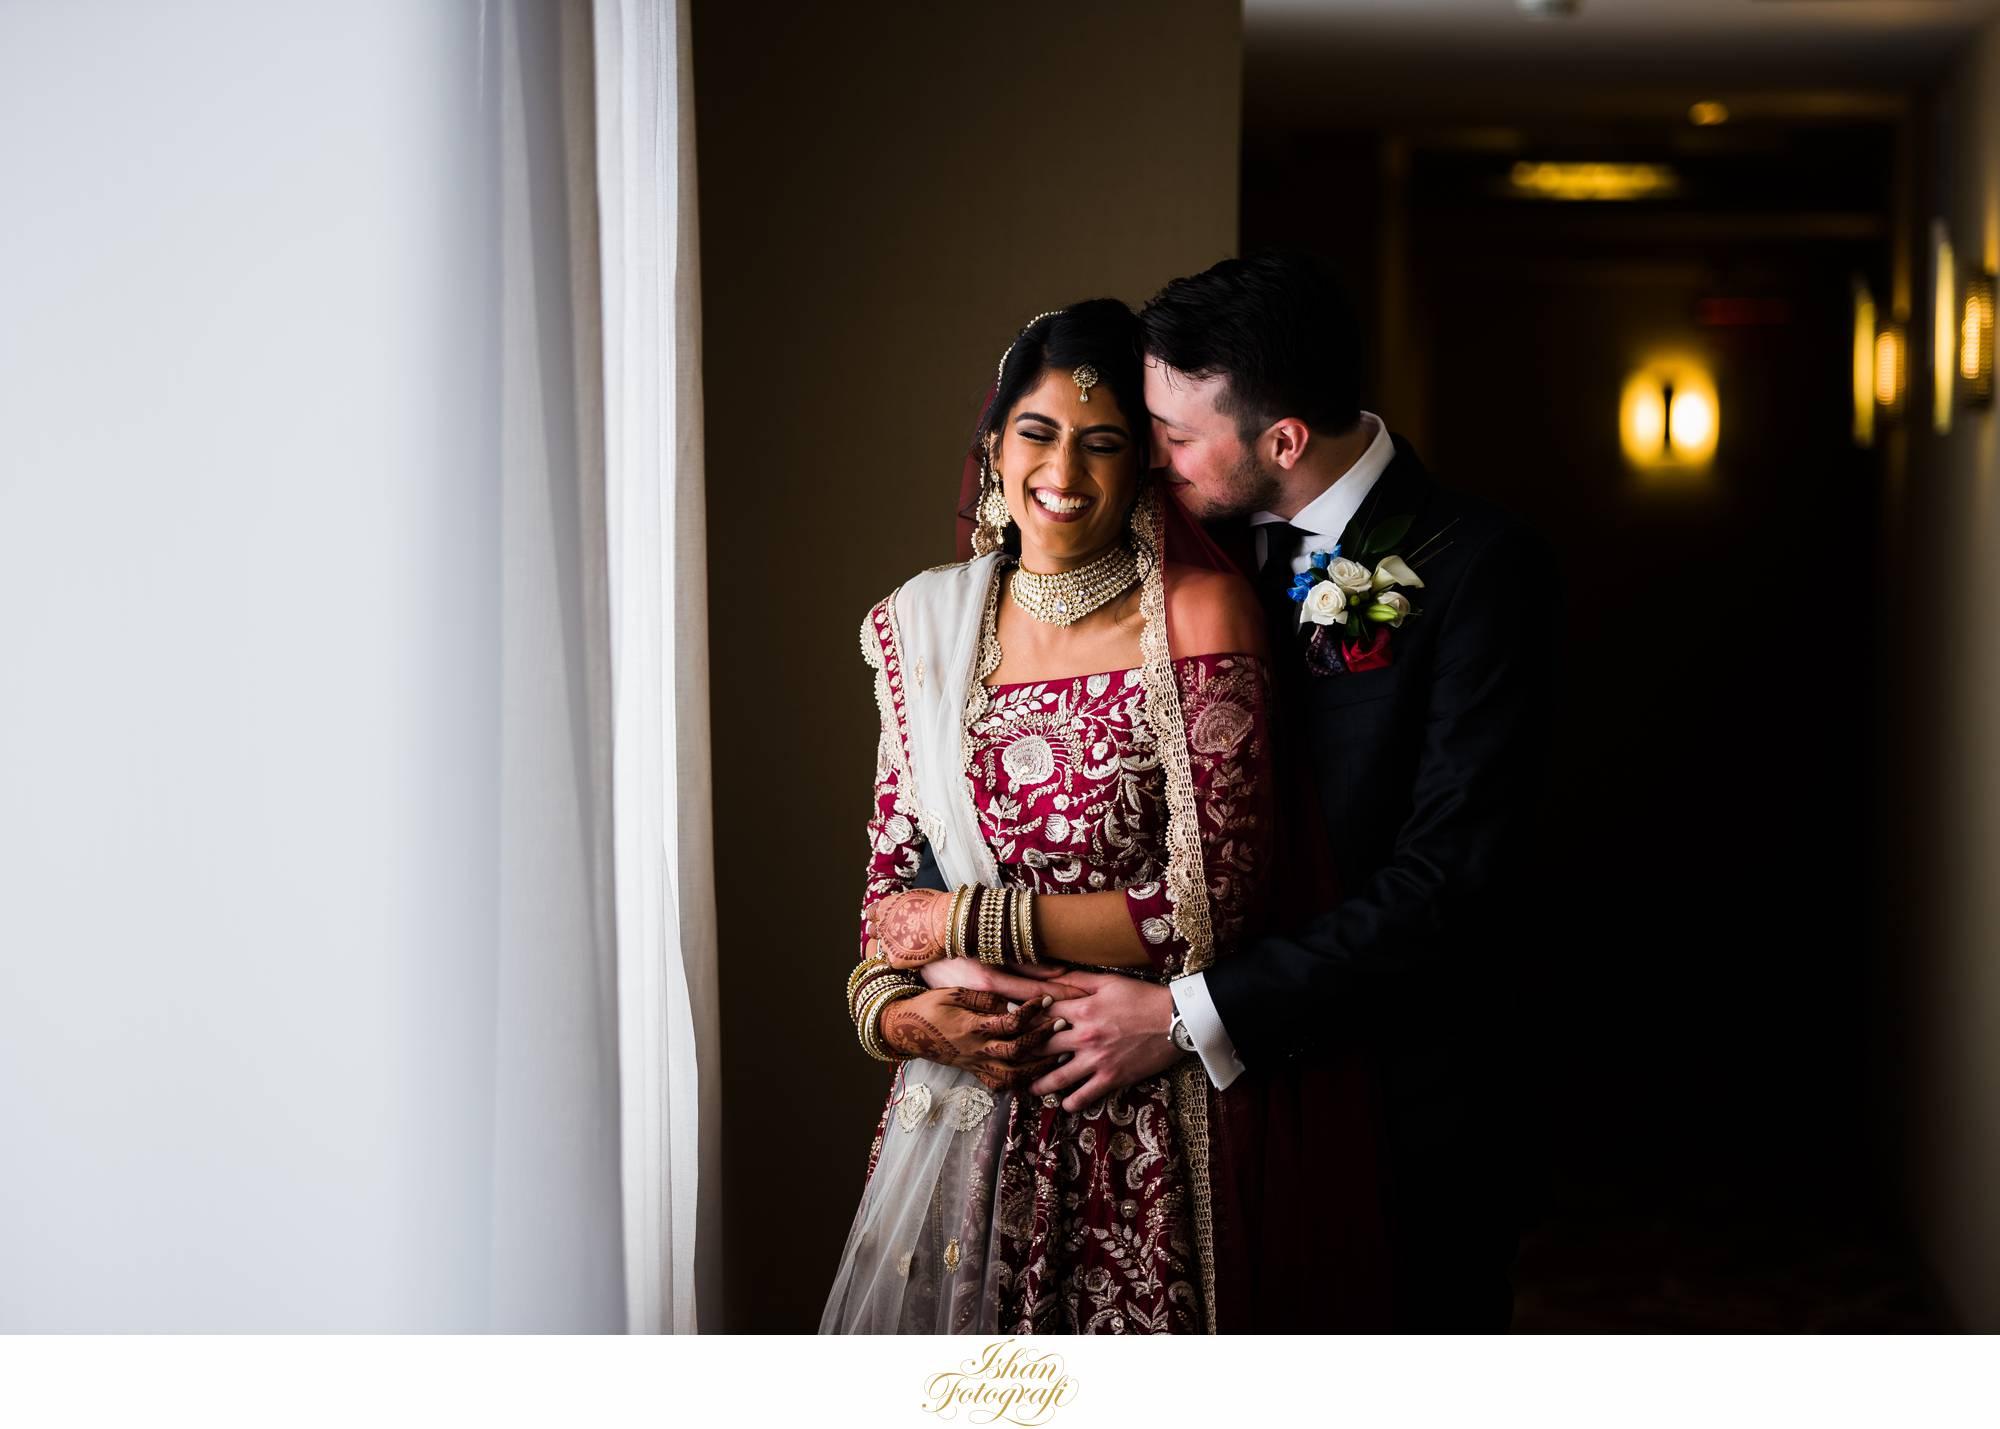 the-heldrich-hotel-wedding-photography